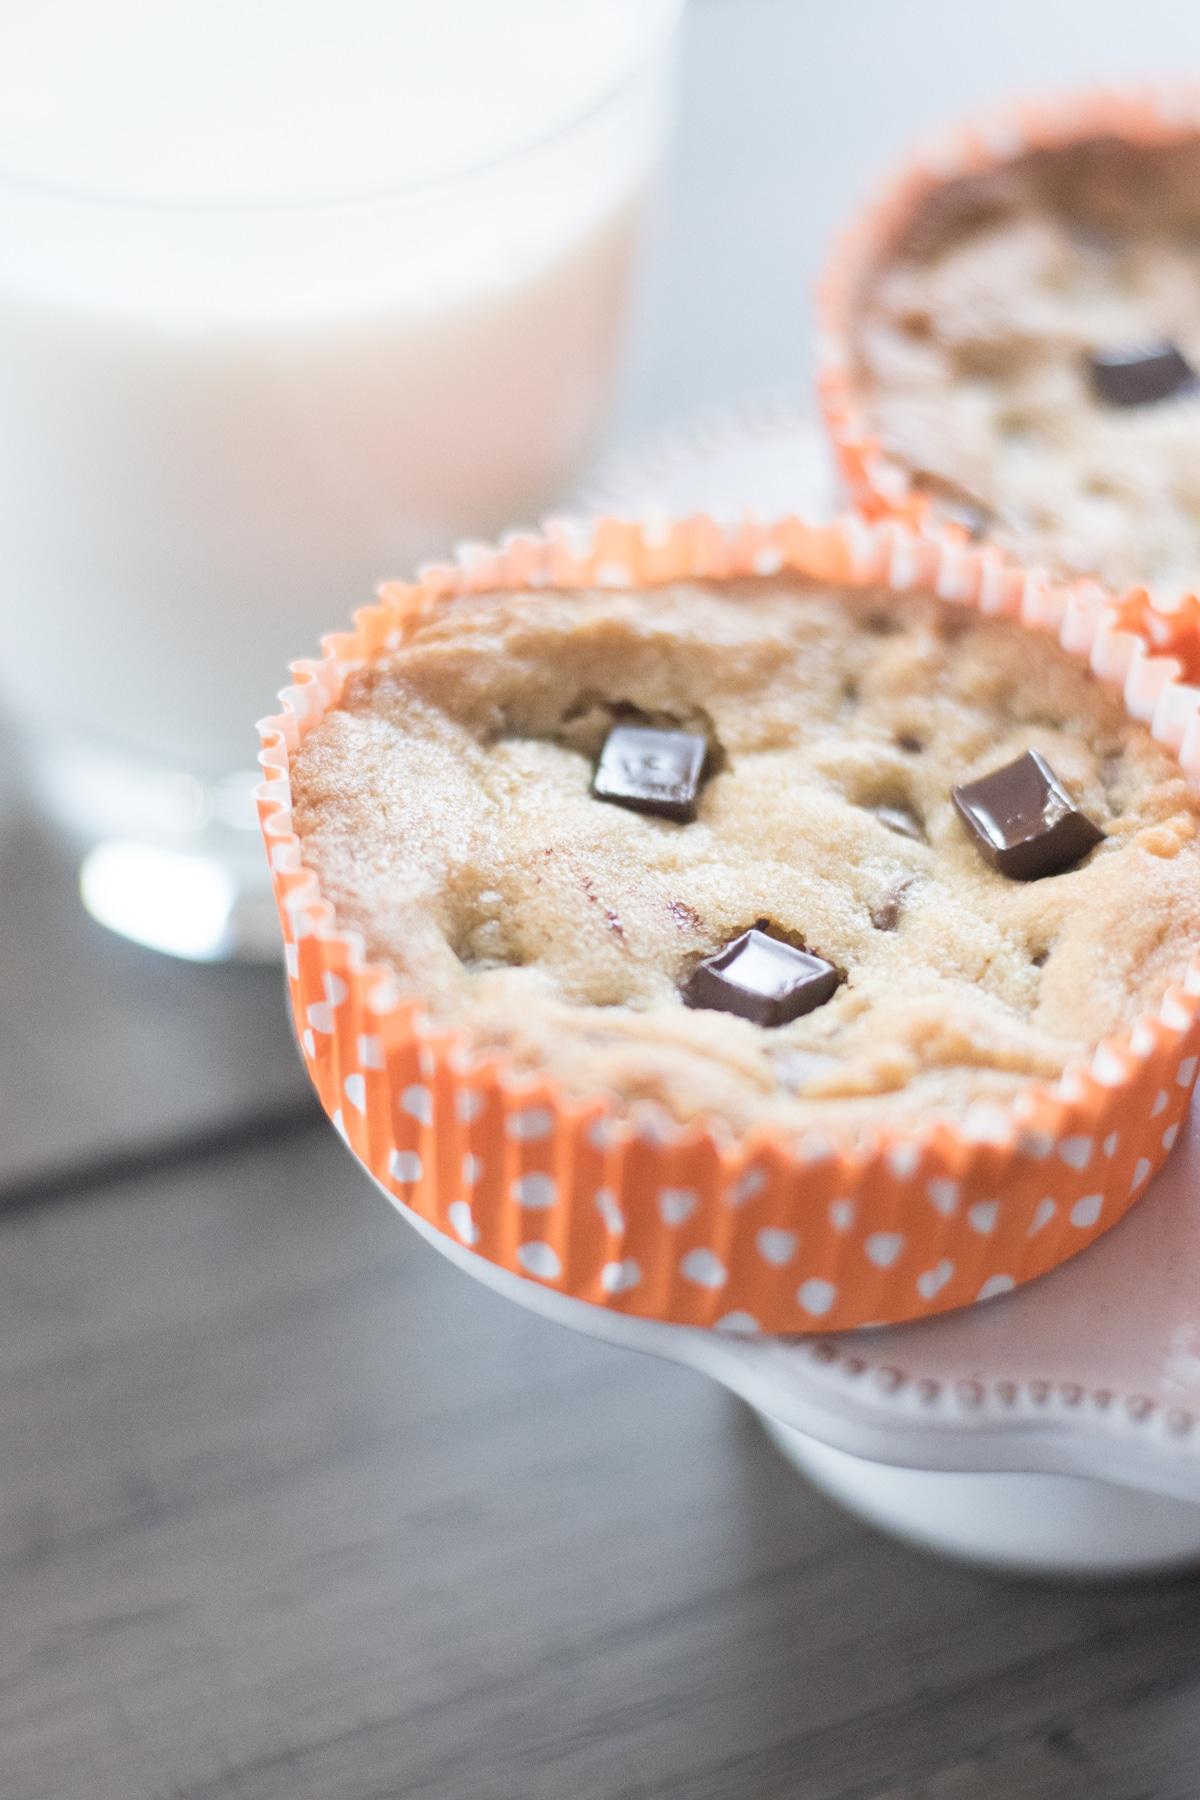 Jack Jack Num Num Cookies Recipe from Disneyland